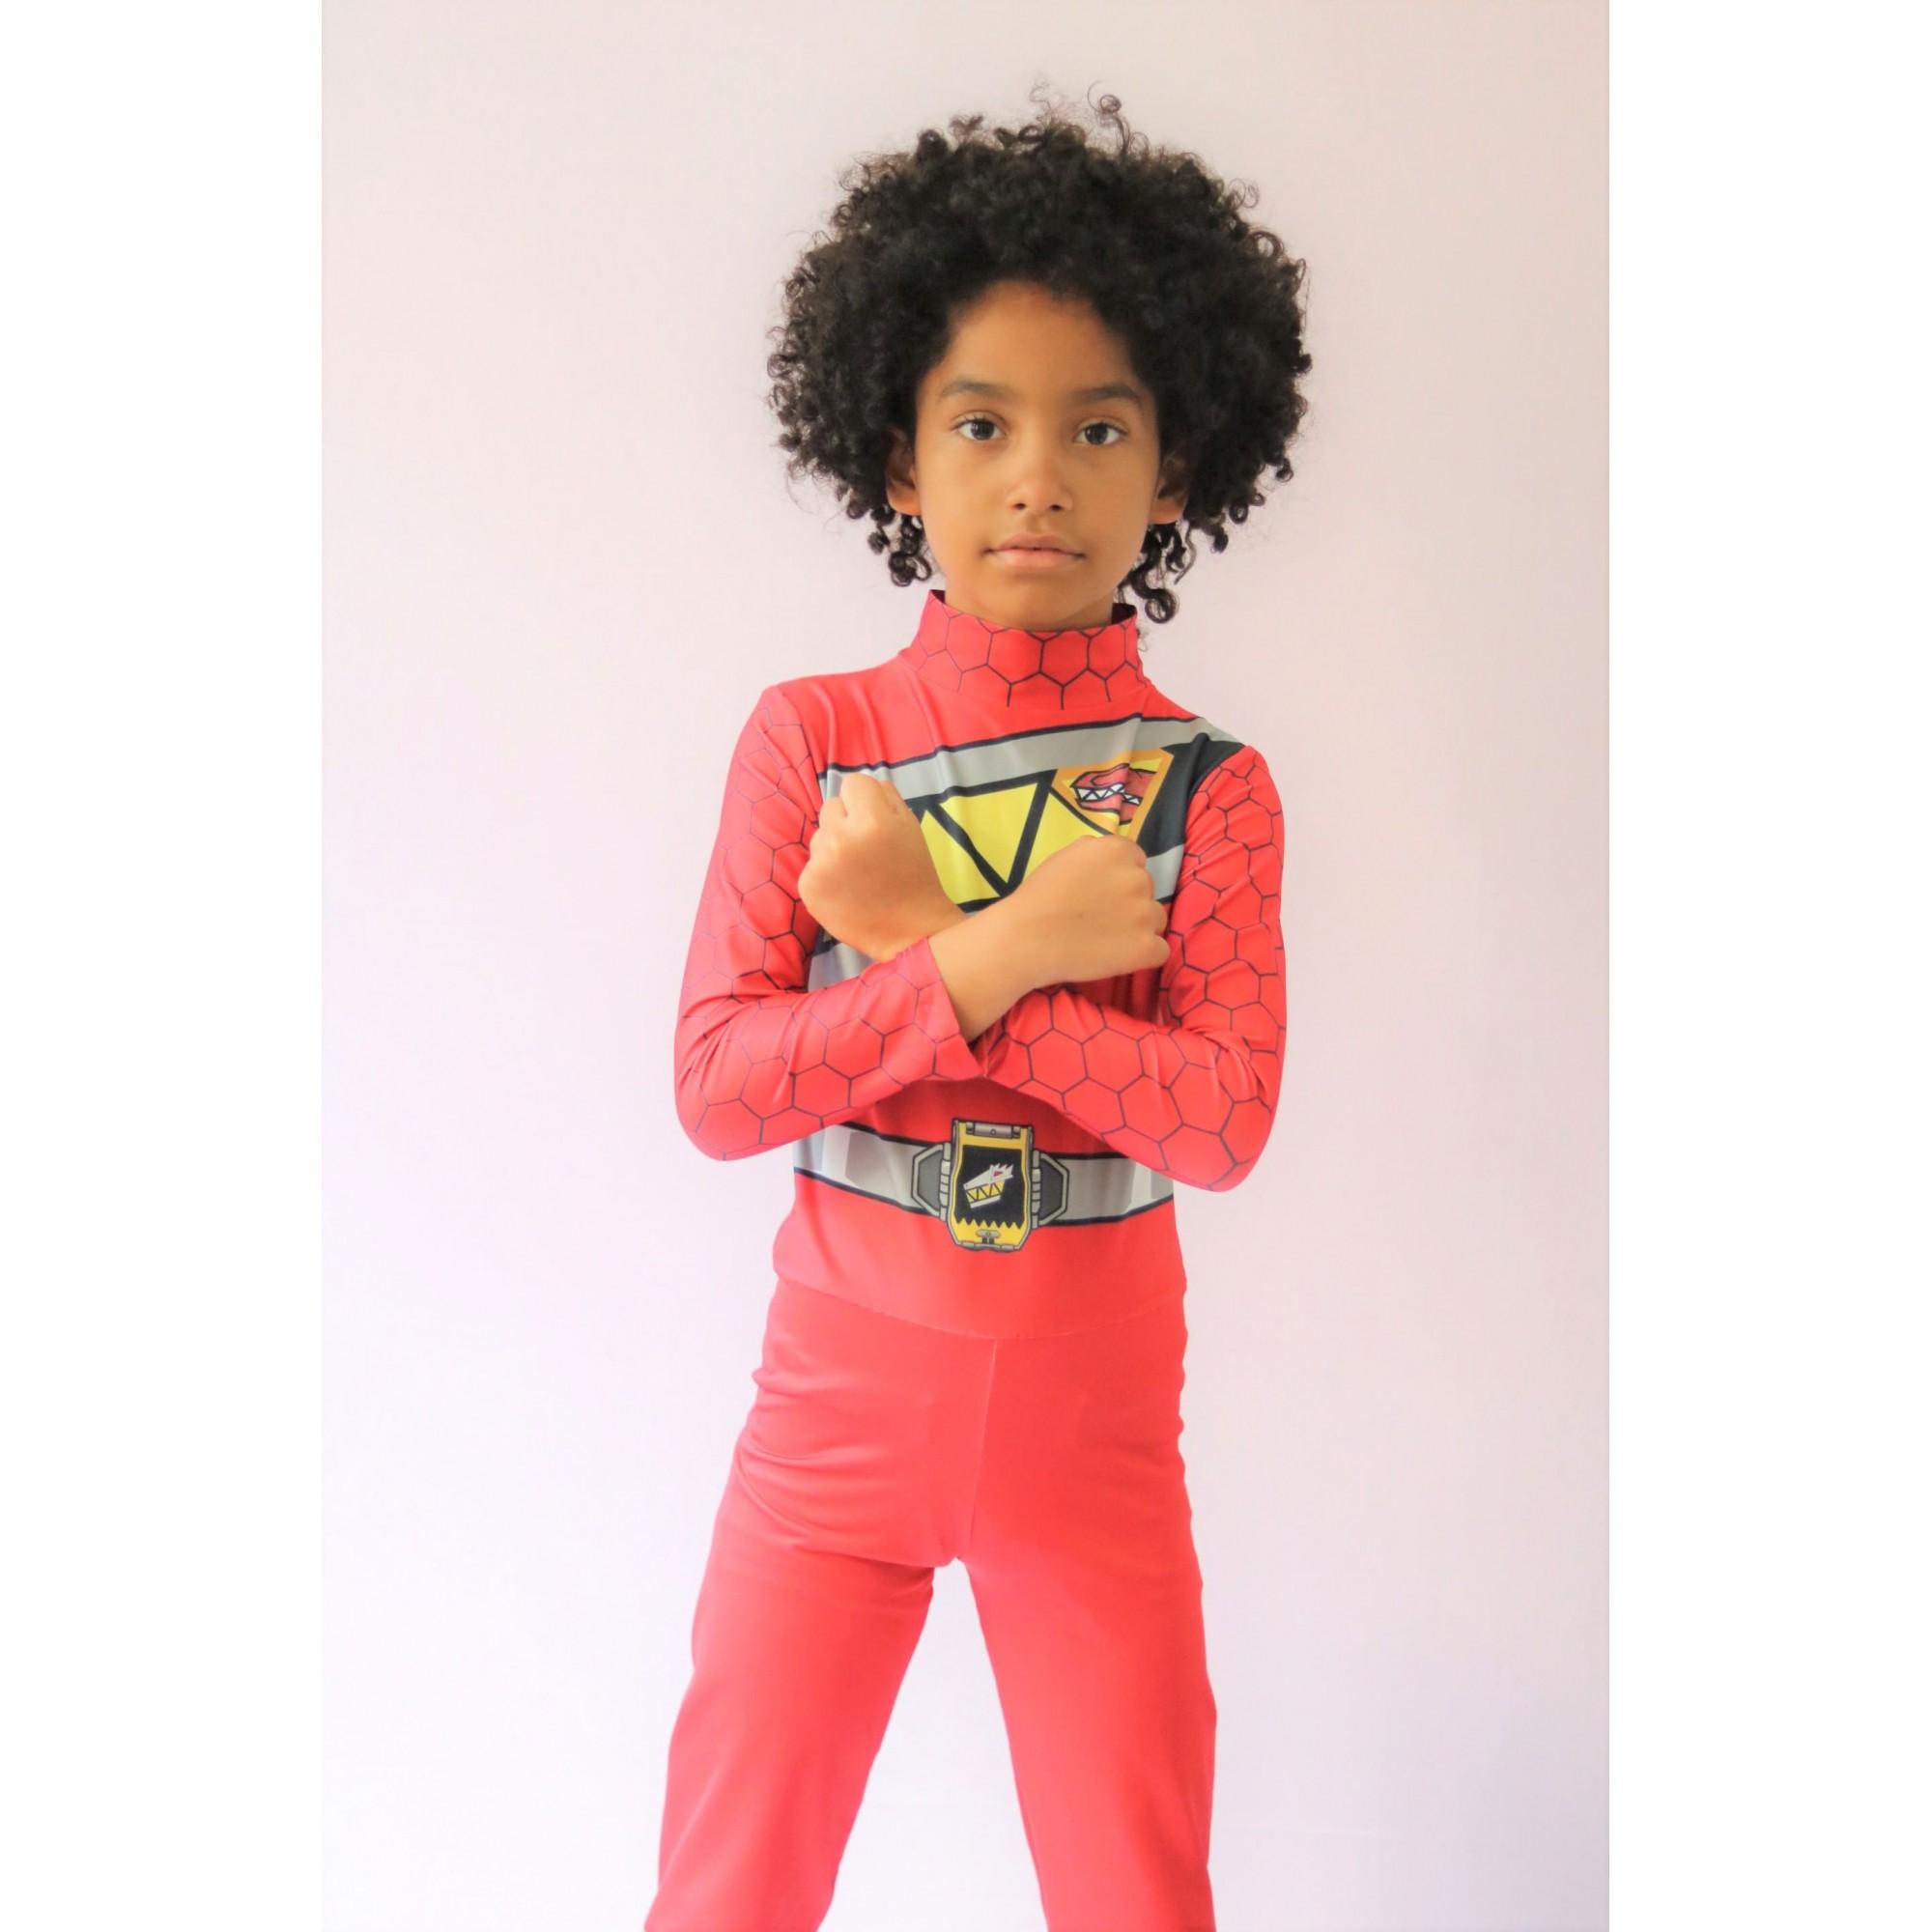 Fantasia Power Rangers - Dino Charger